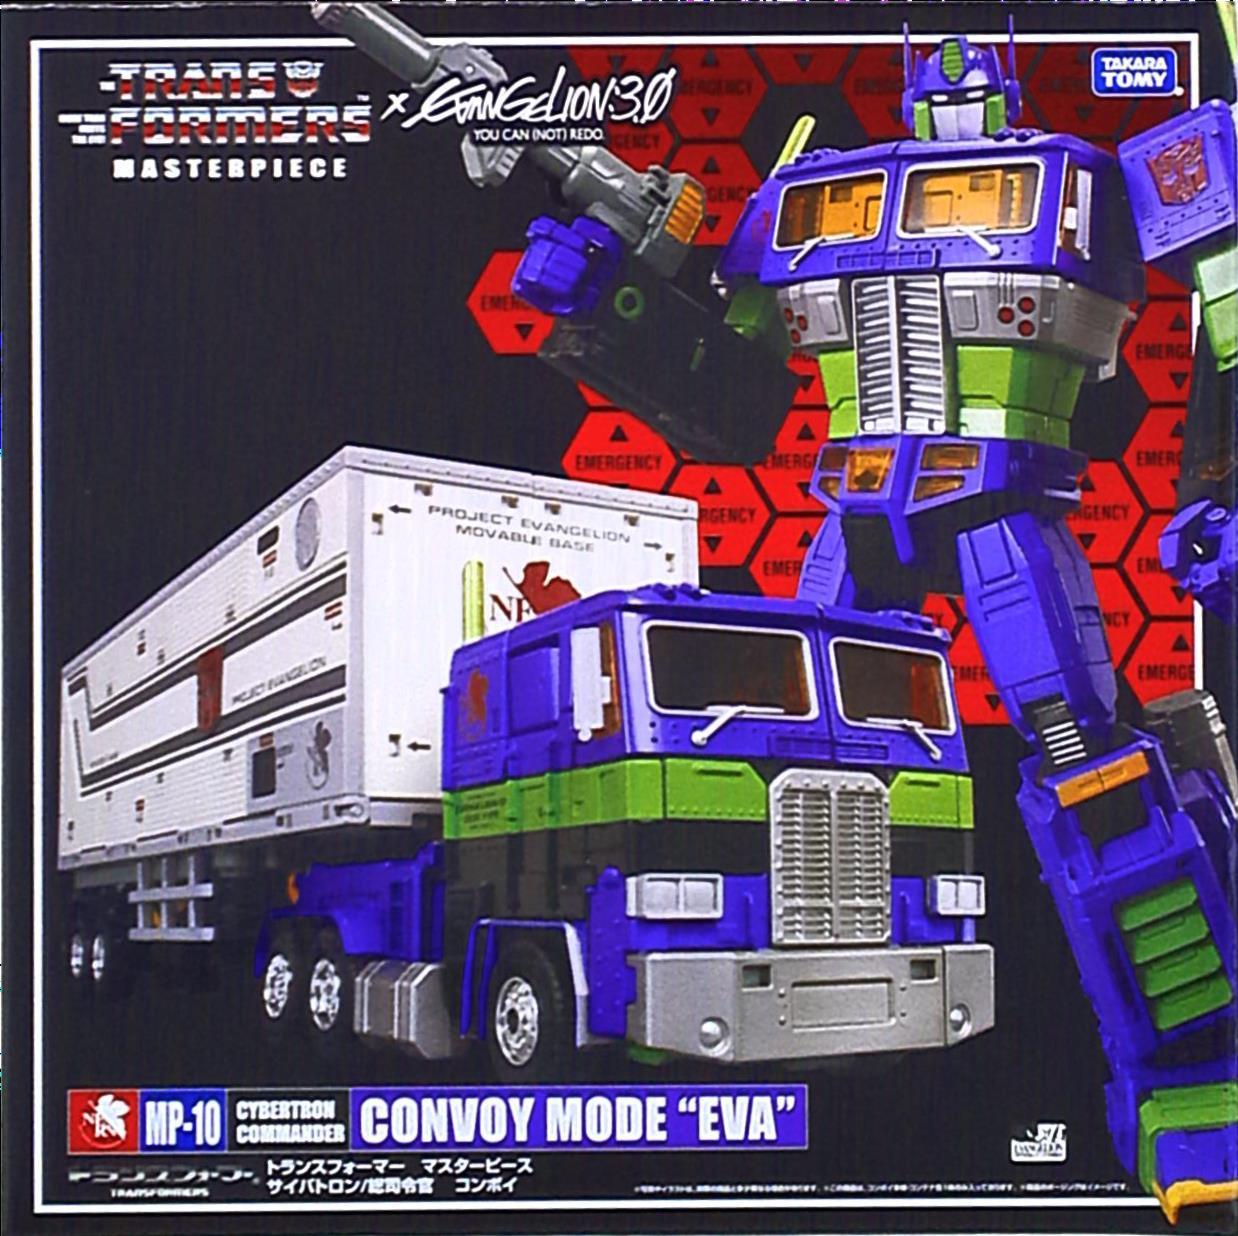 Mandarake Takara Tomy Transformers Masterpiecemp 10convoy Mode Mp 10 Optimus Prime Convoy Eva